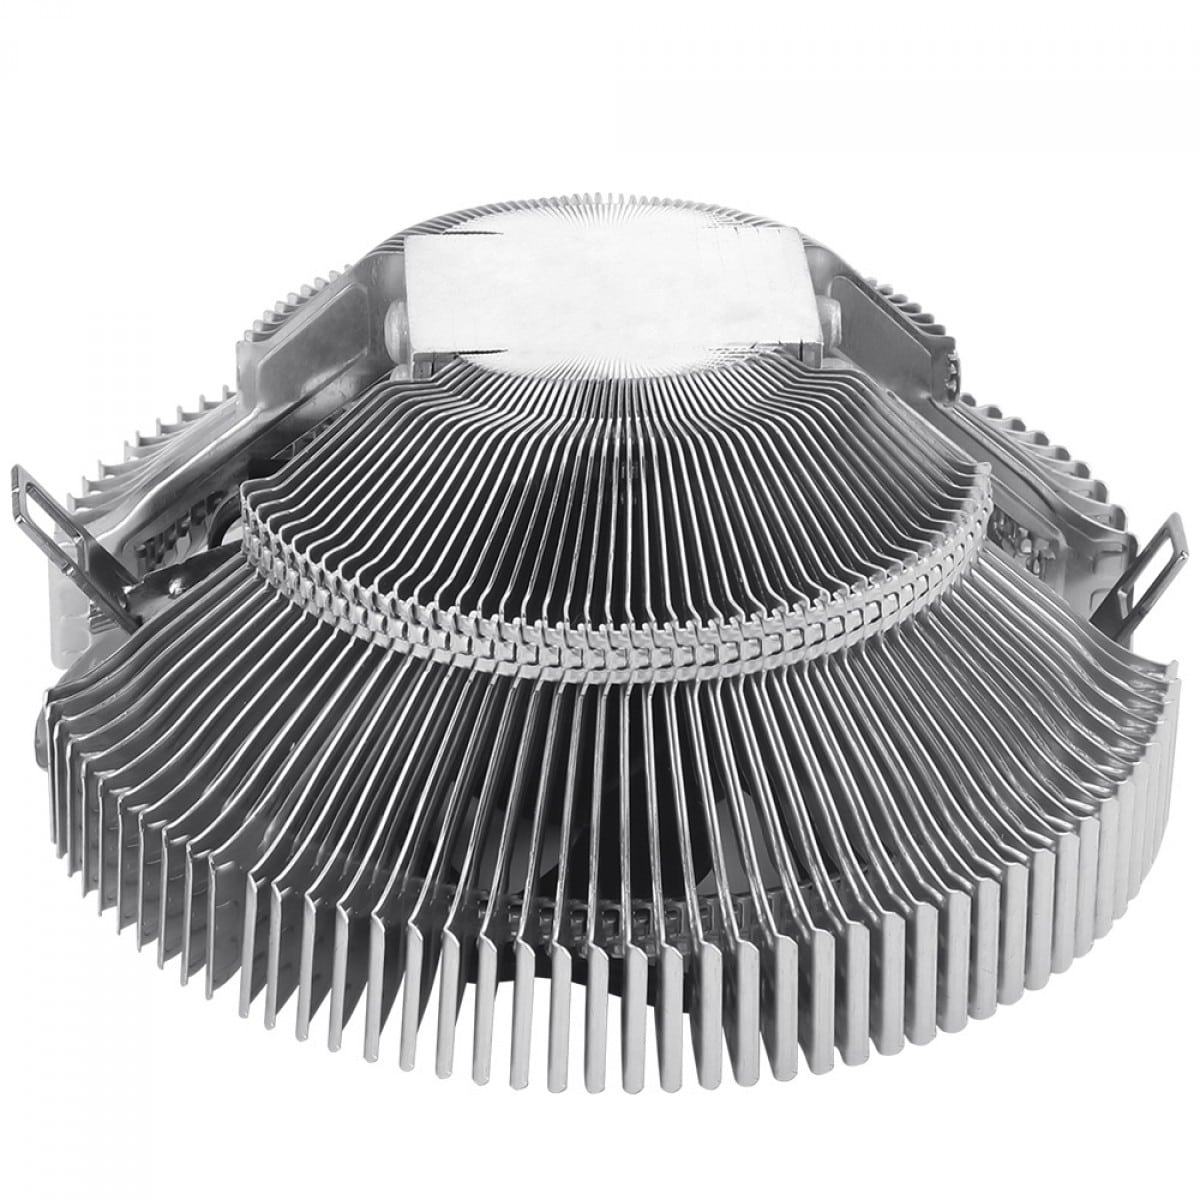 Cooler para Processador T-Dagger Viti, 90mm, Intel-AMD, T-GC9110